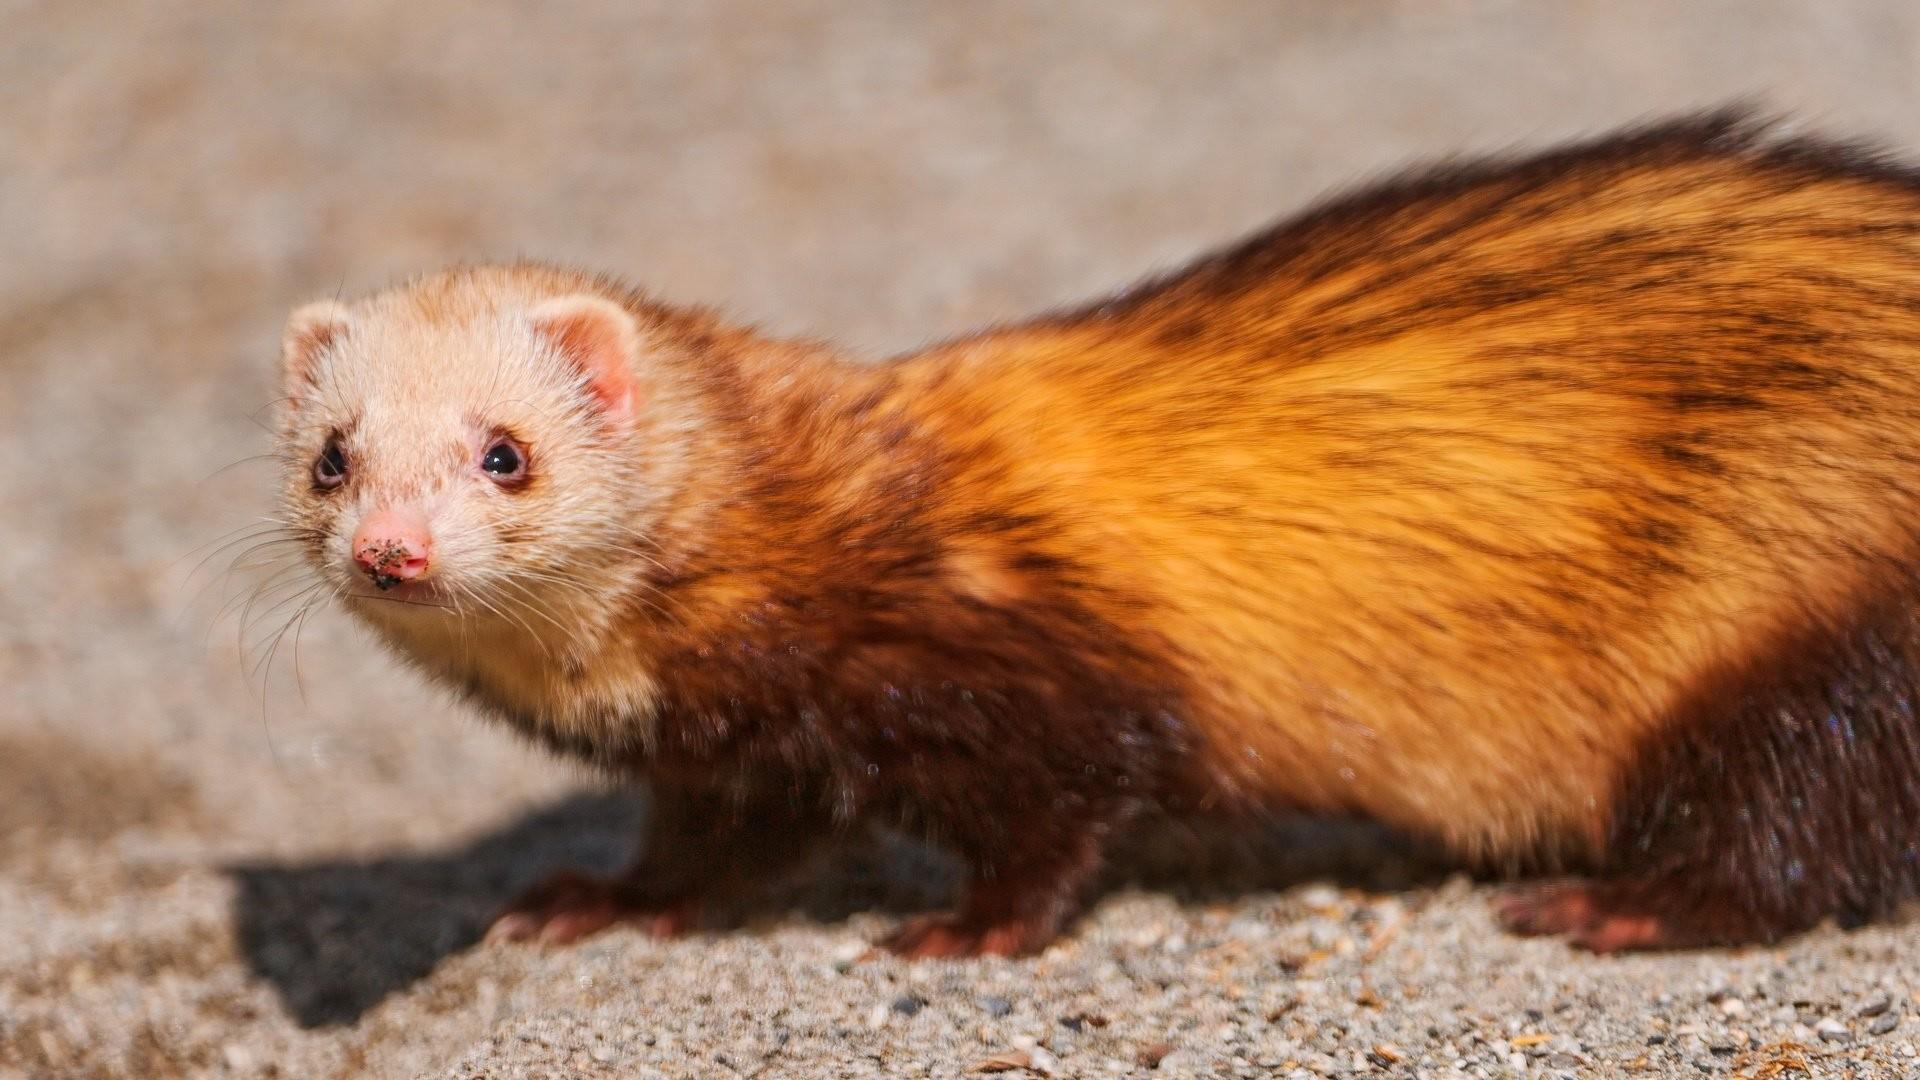 Res: 1920x1080, cute white ferret